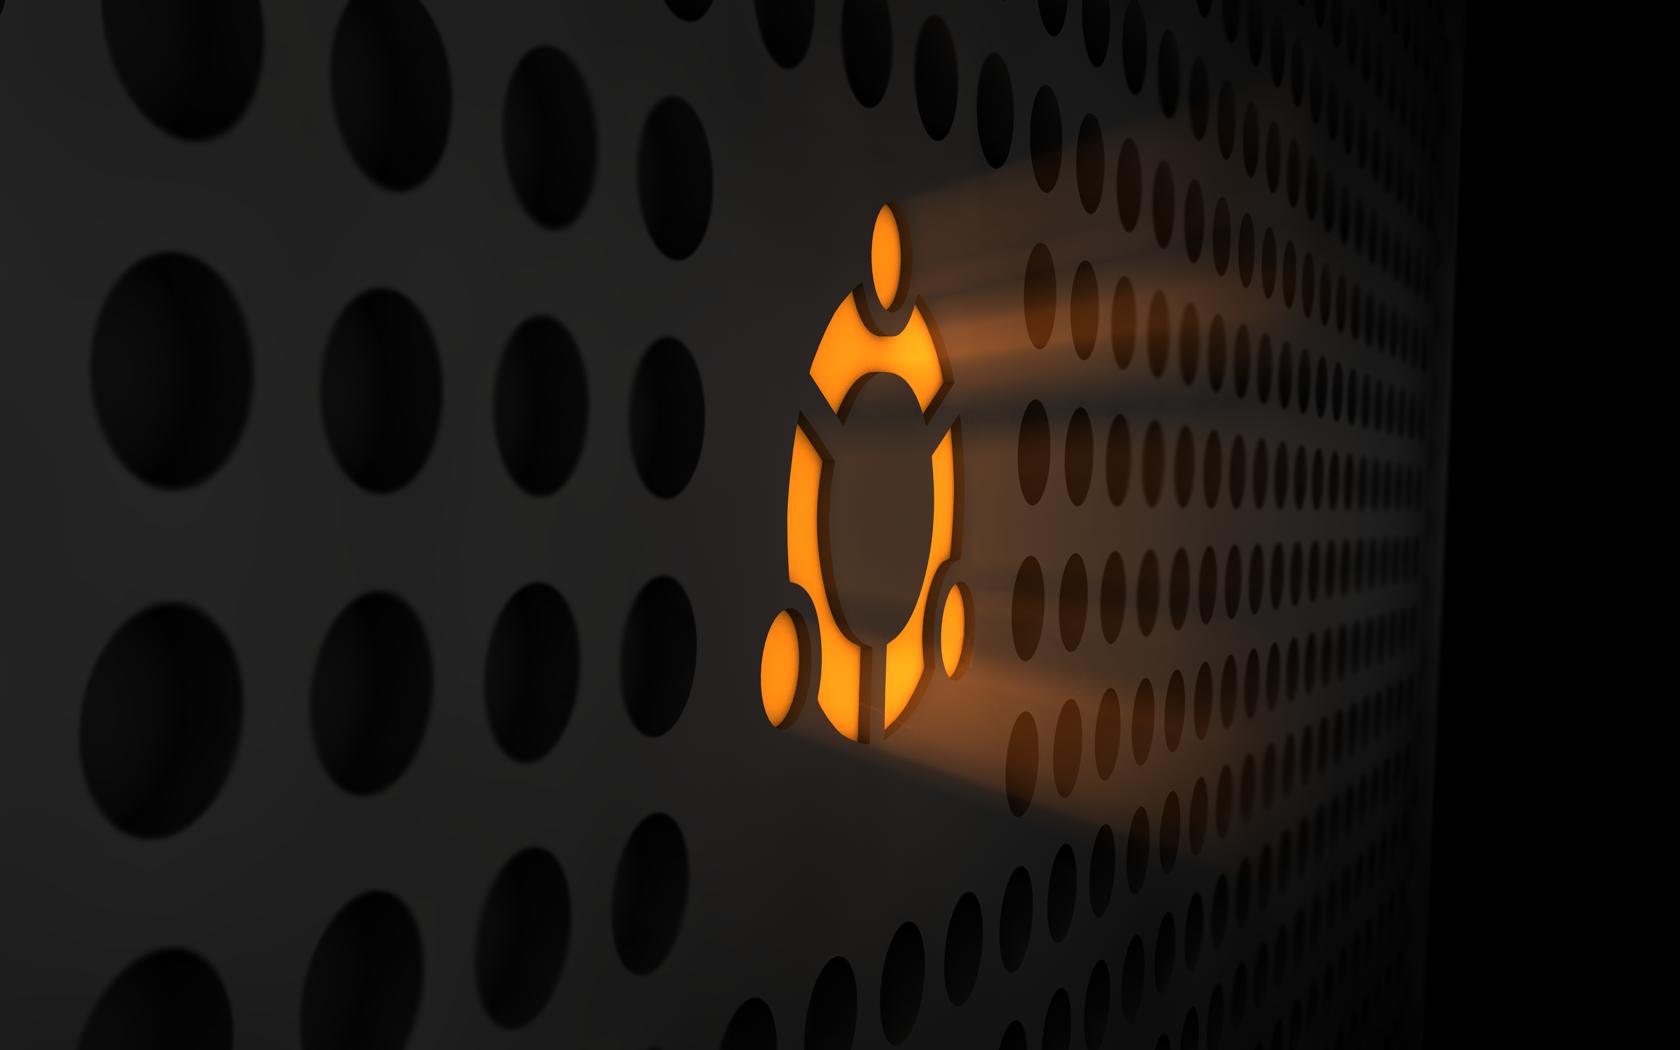 wallpaper Ubuntu Wallpapers 1366x768 hd wallpaper background desktop 1680x1050